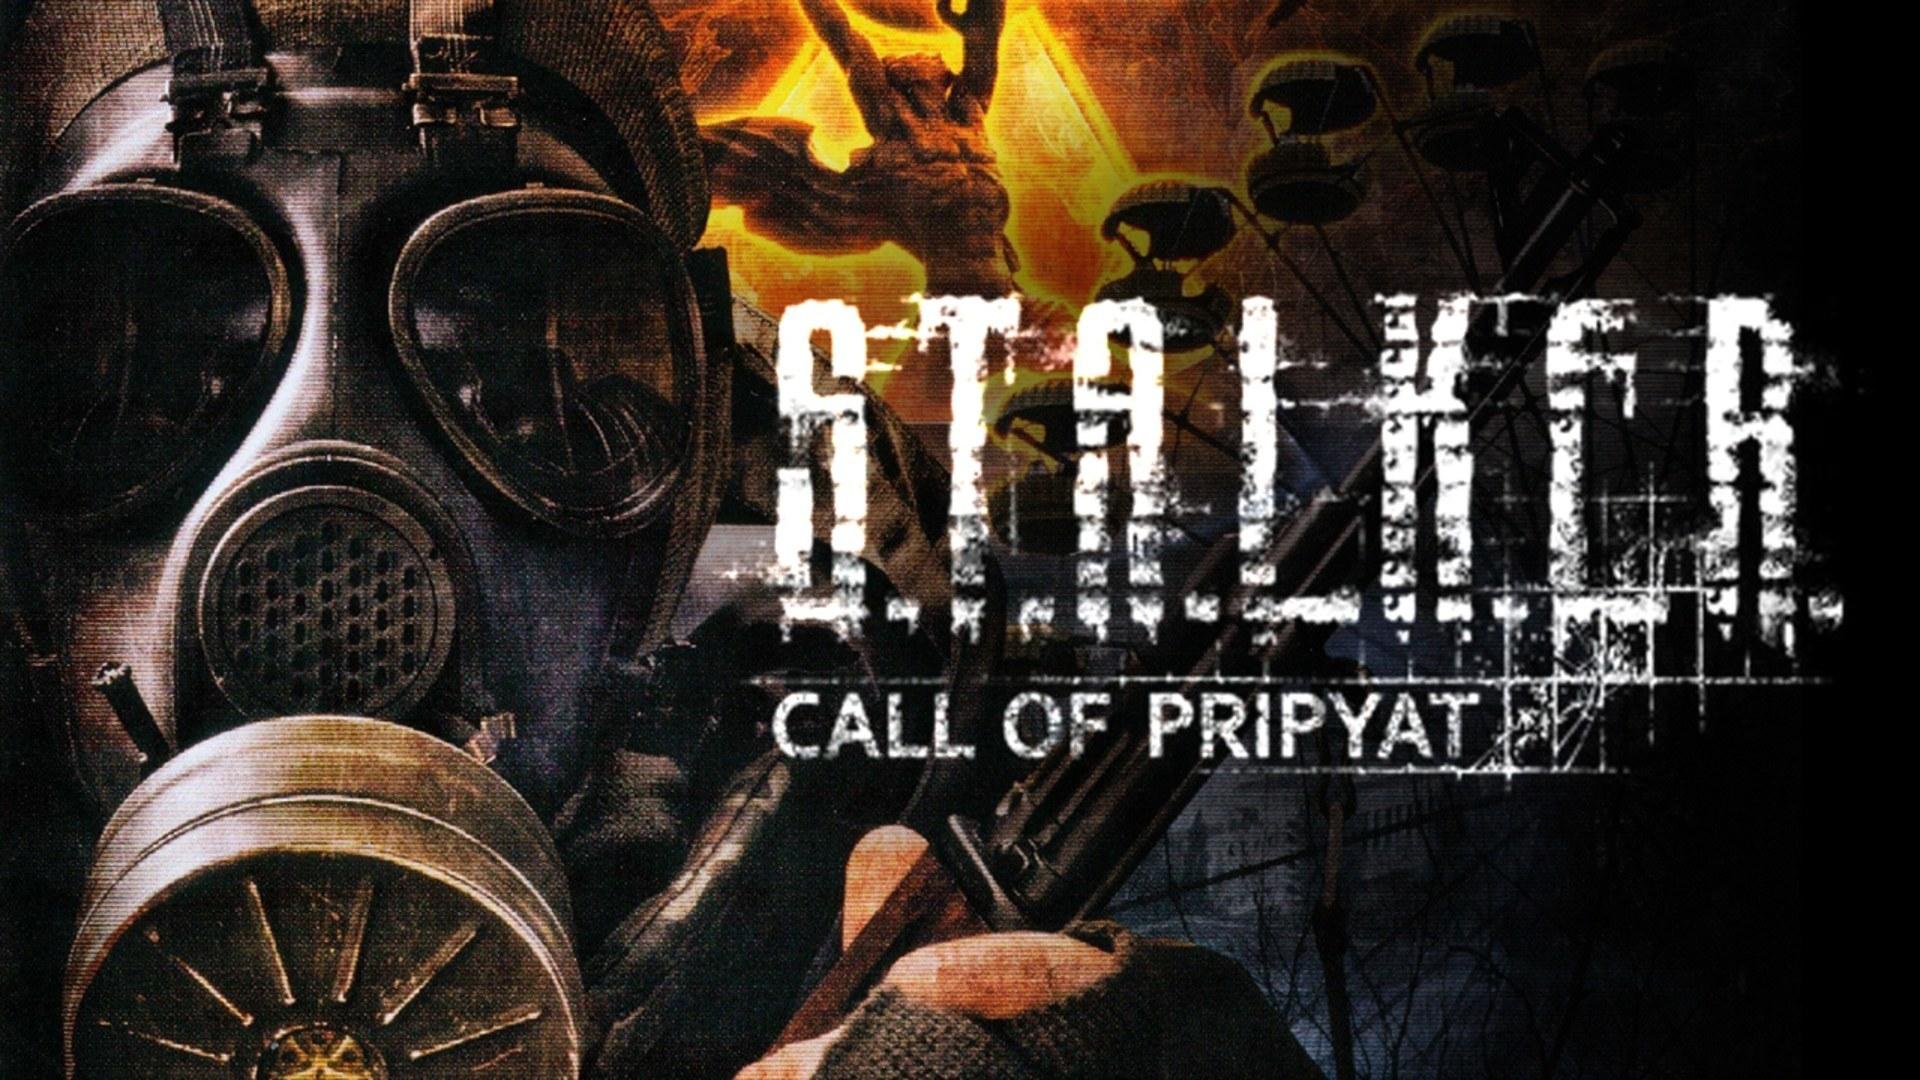 S T A L K E R Call Of Pripyat Pc Steam Game Fanatical